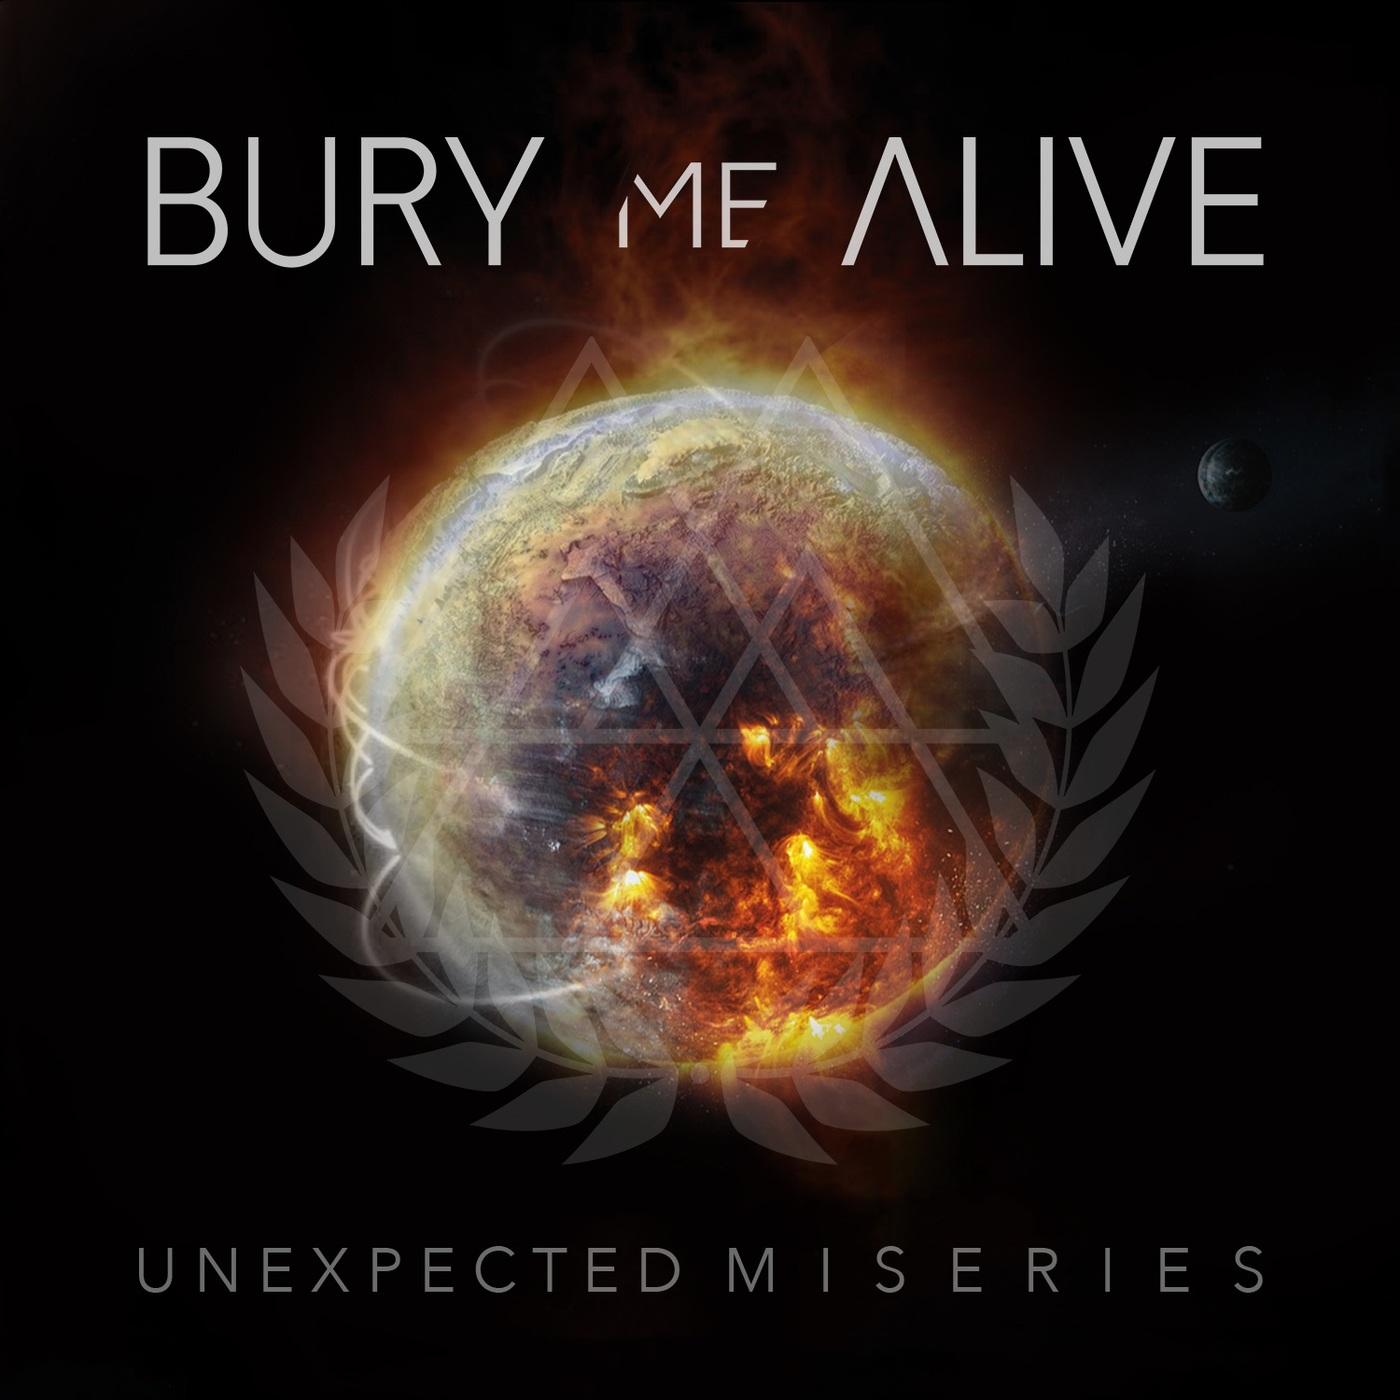 Bury Me Alive - Unexpected Miseries (2019)